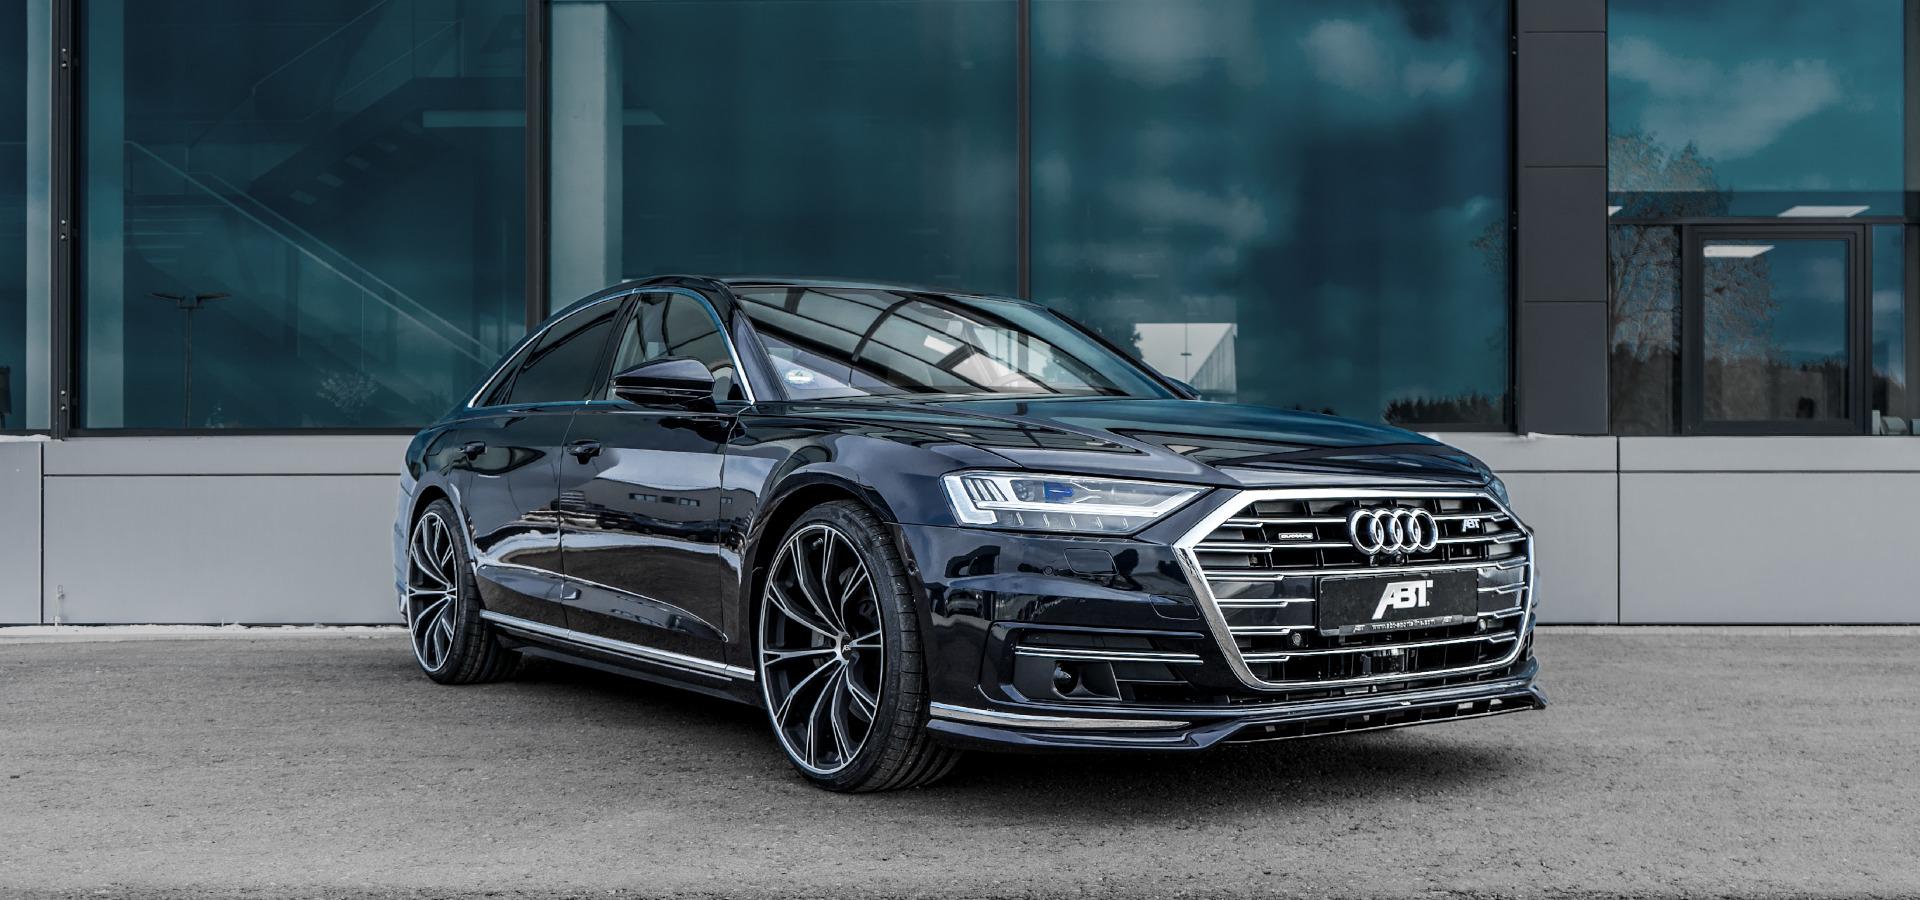 Kekurangan Audi A8 Rs Tangguh